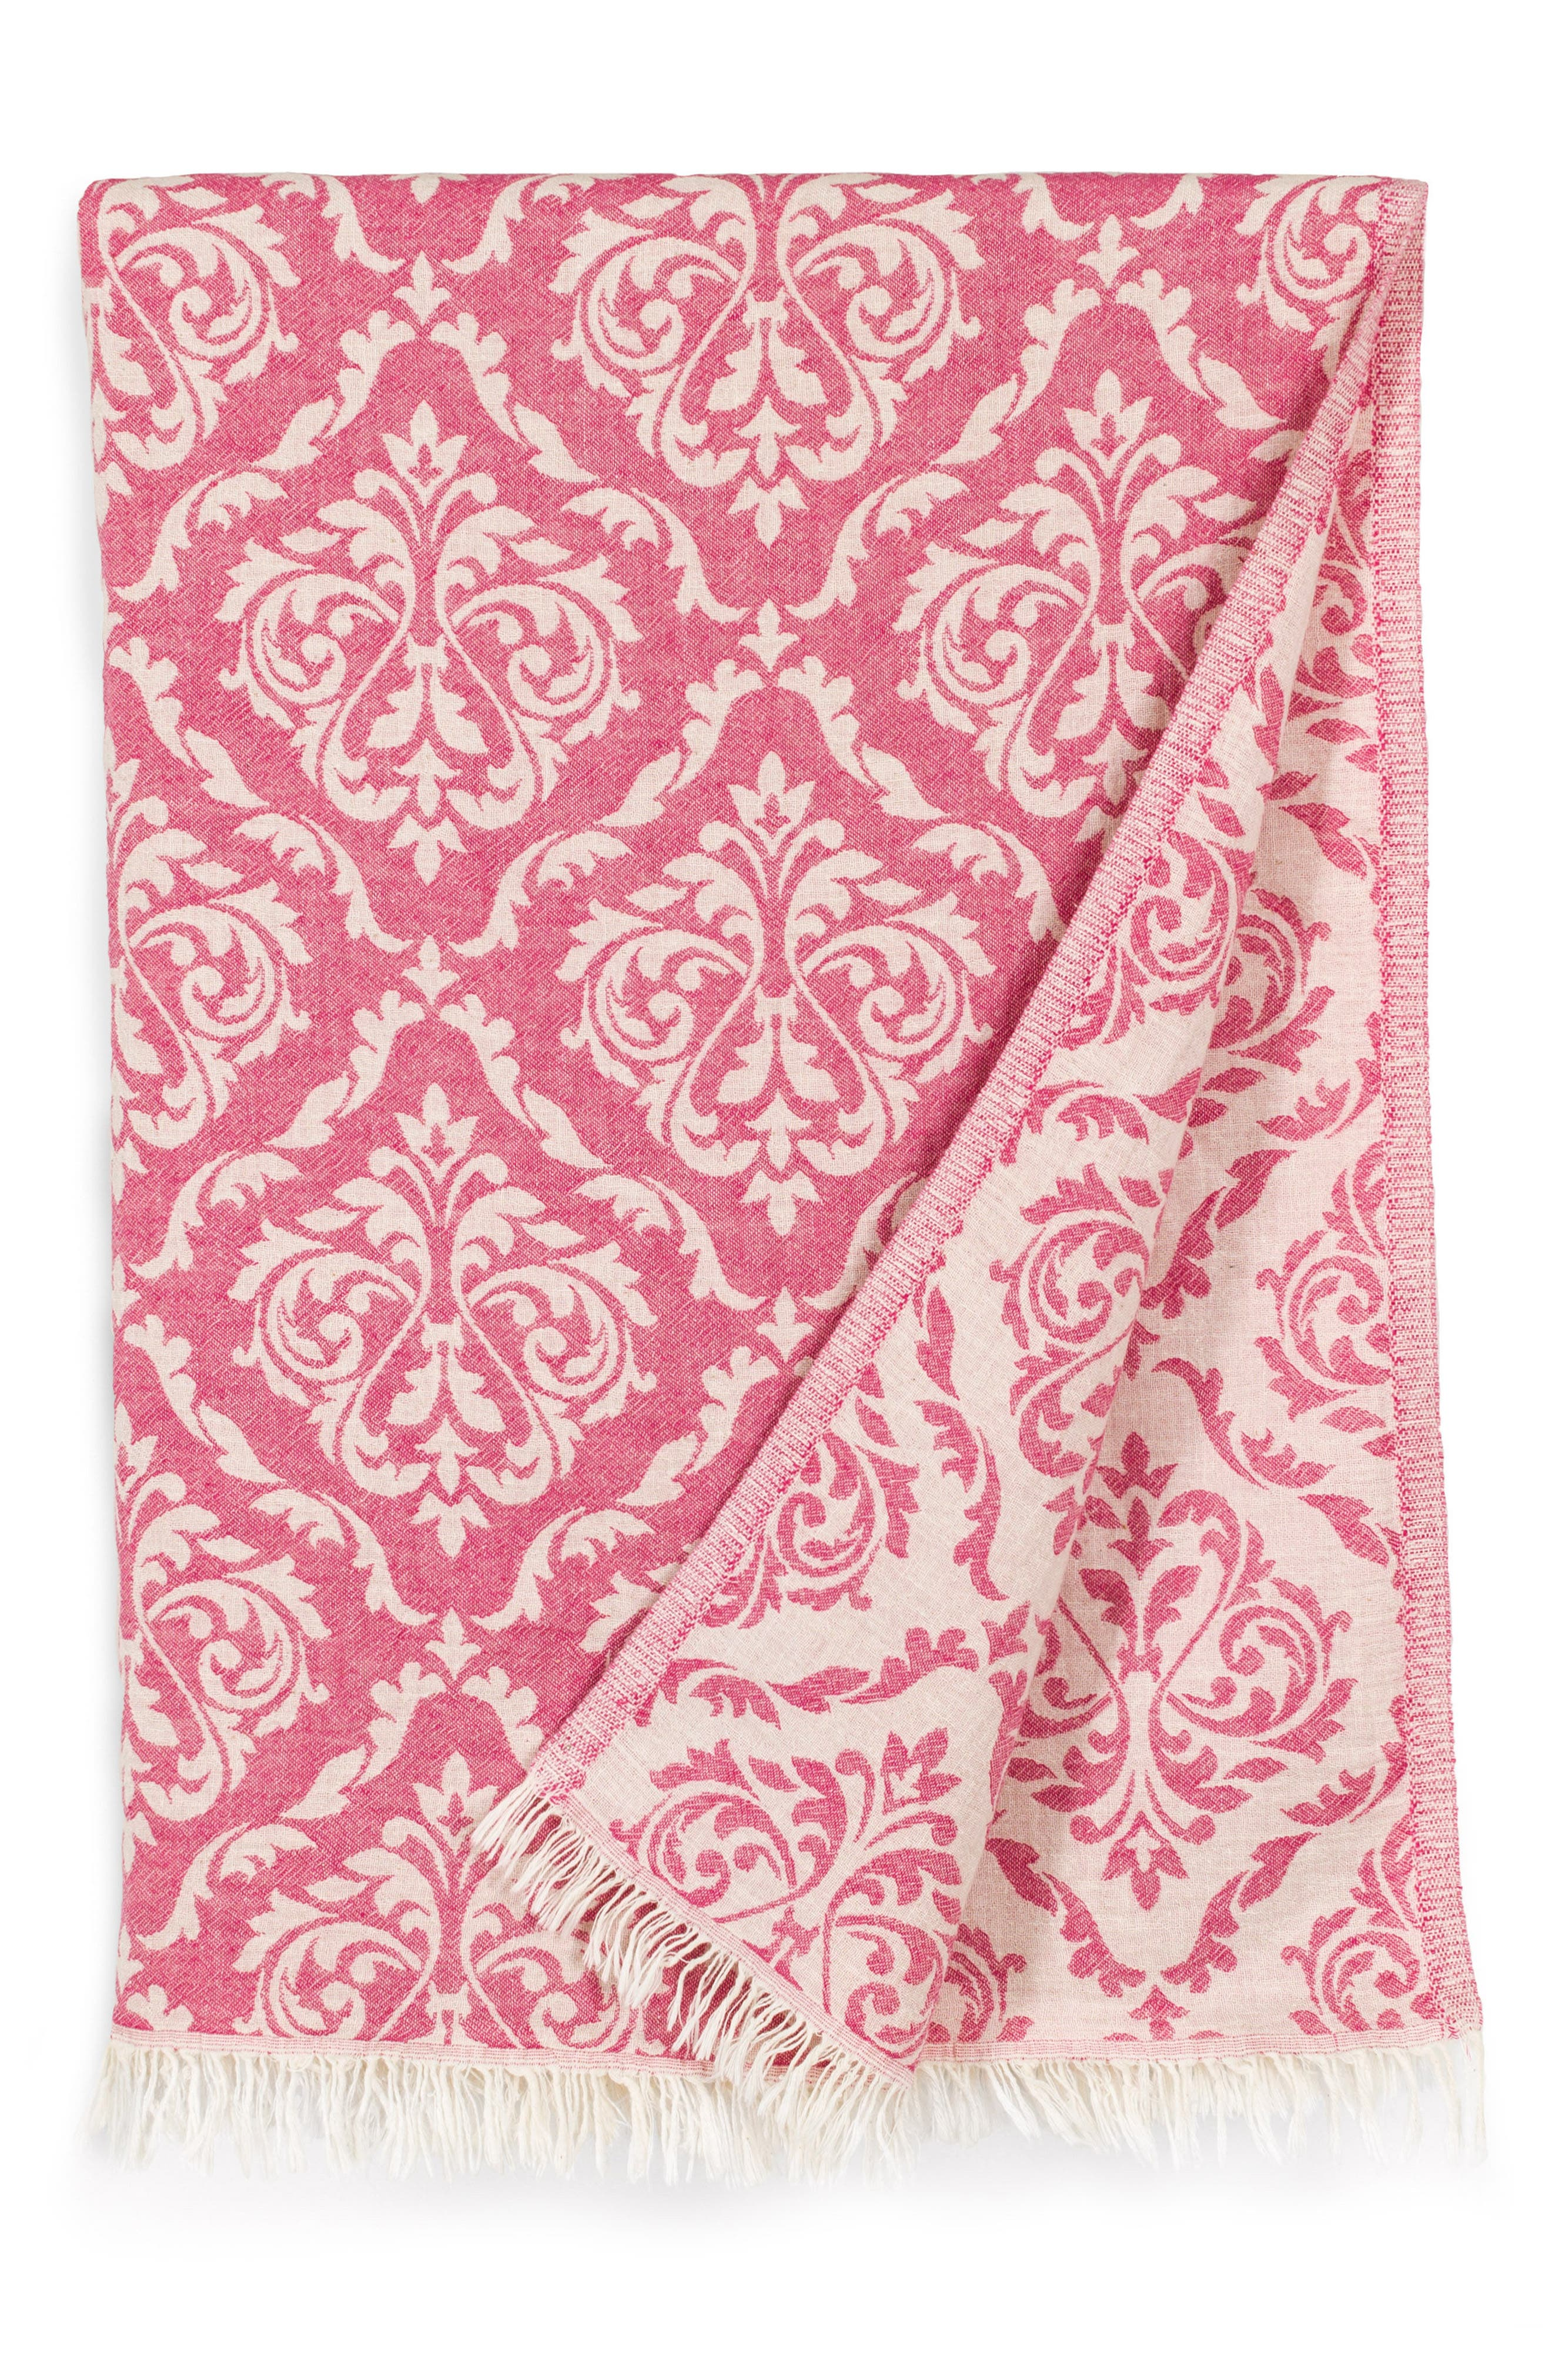 Damask Delight Turkish Pestemal Towel,                             Alternate thumbnail 2, color,                             Red